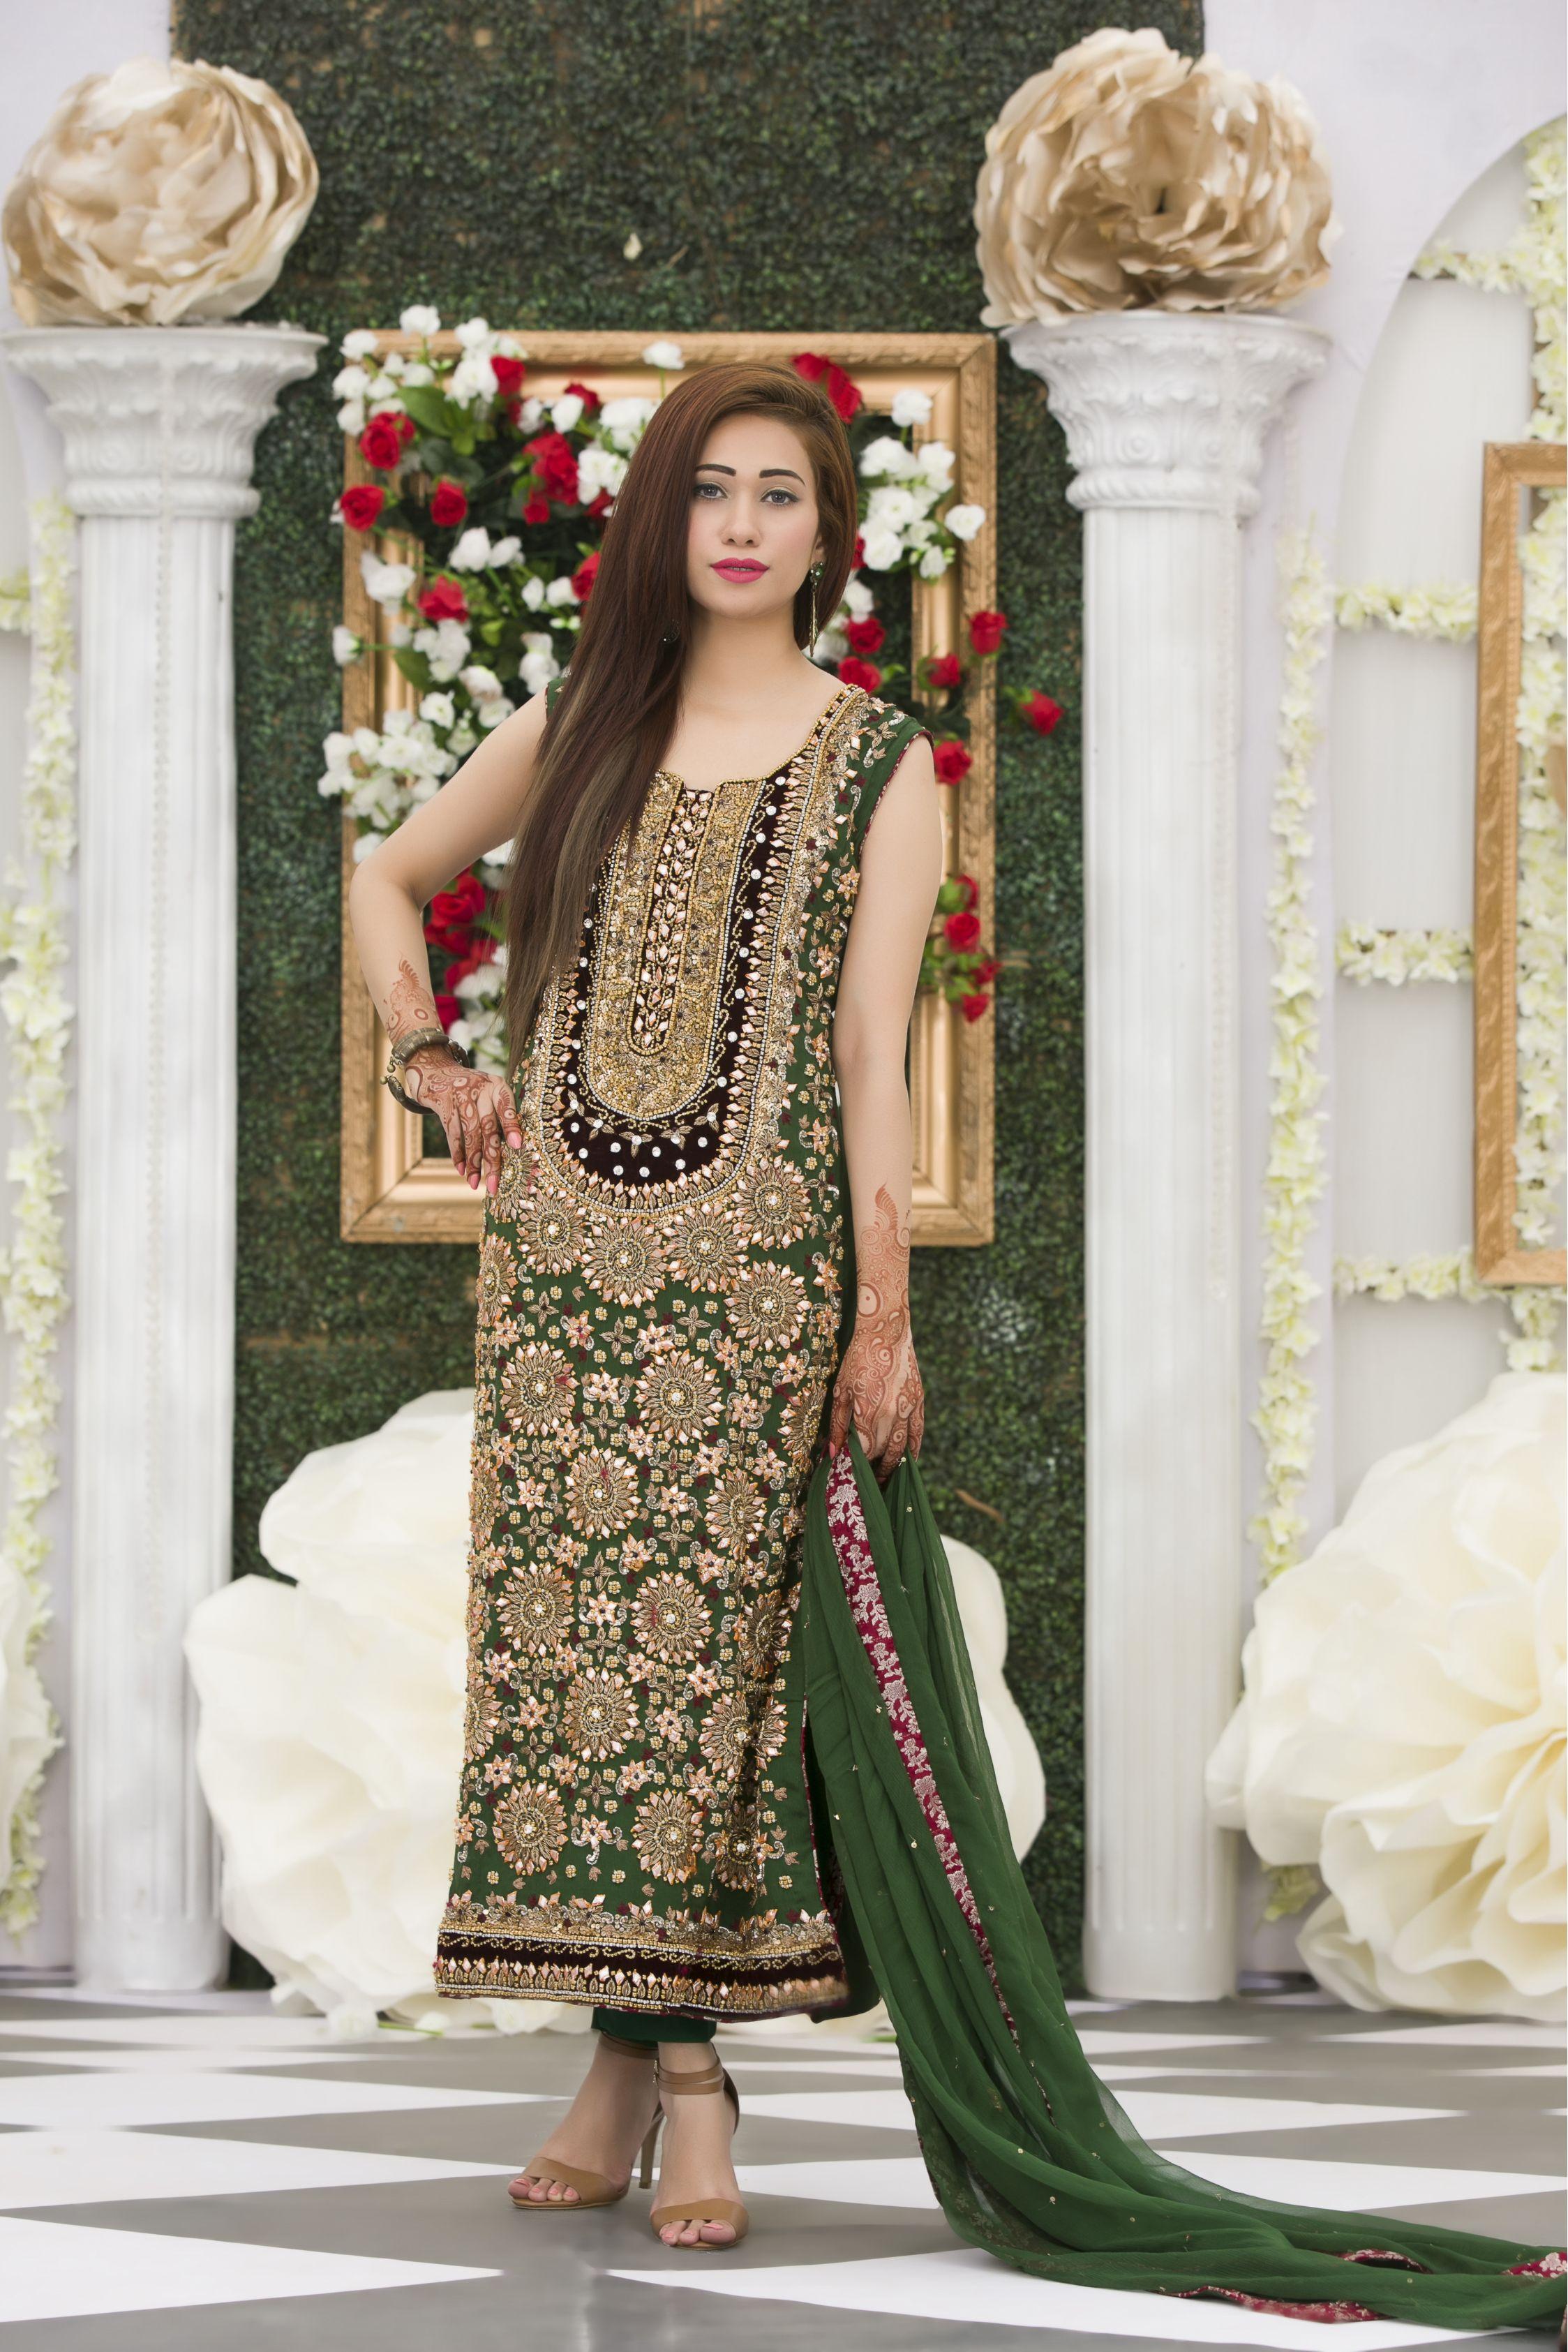 Ladies Mehndi Party : Exclusive bottle green mehndi dress online